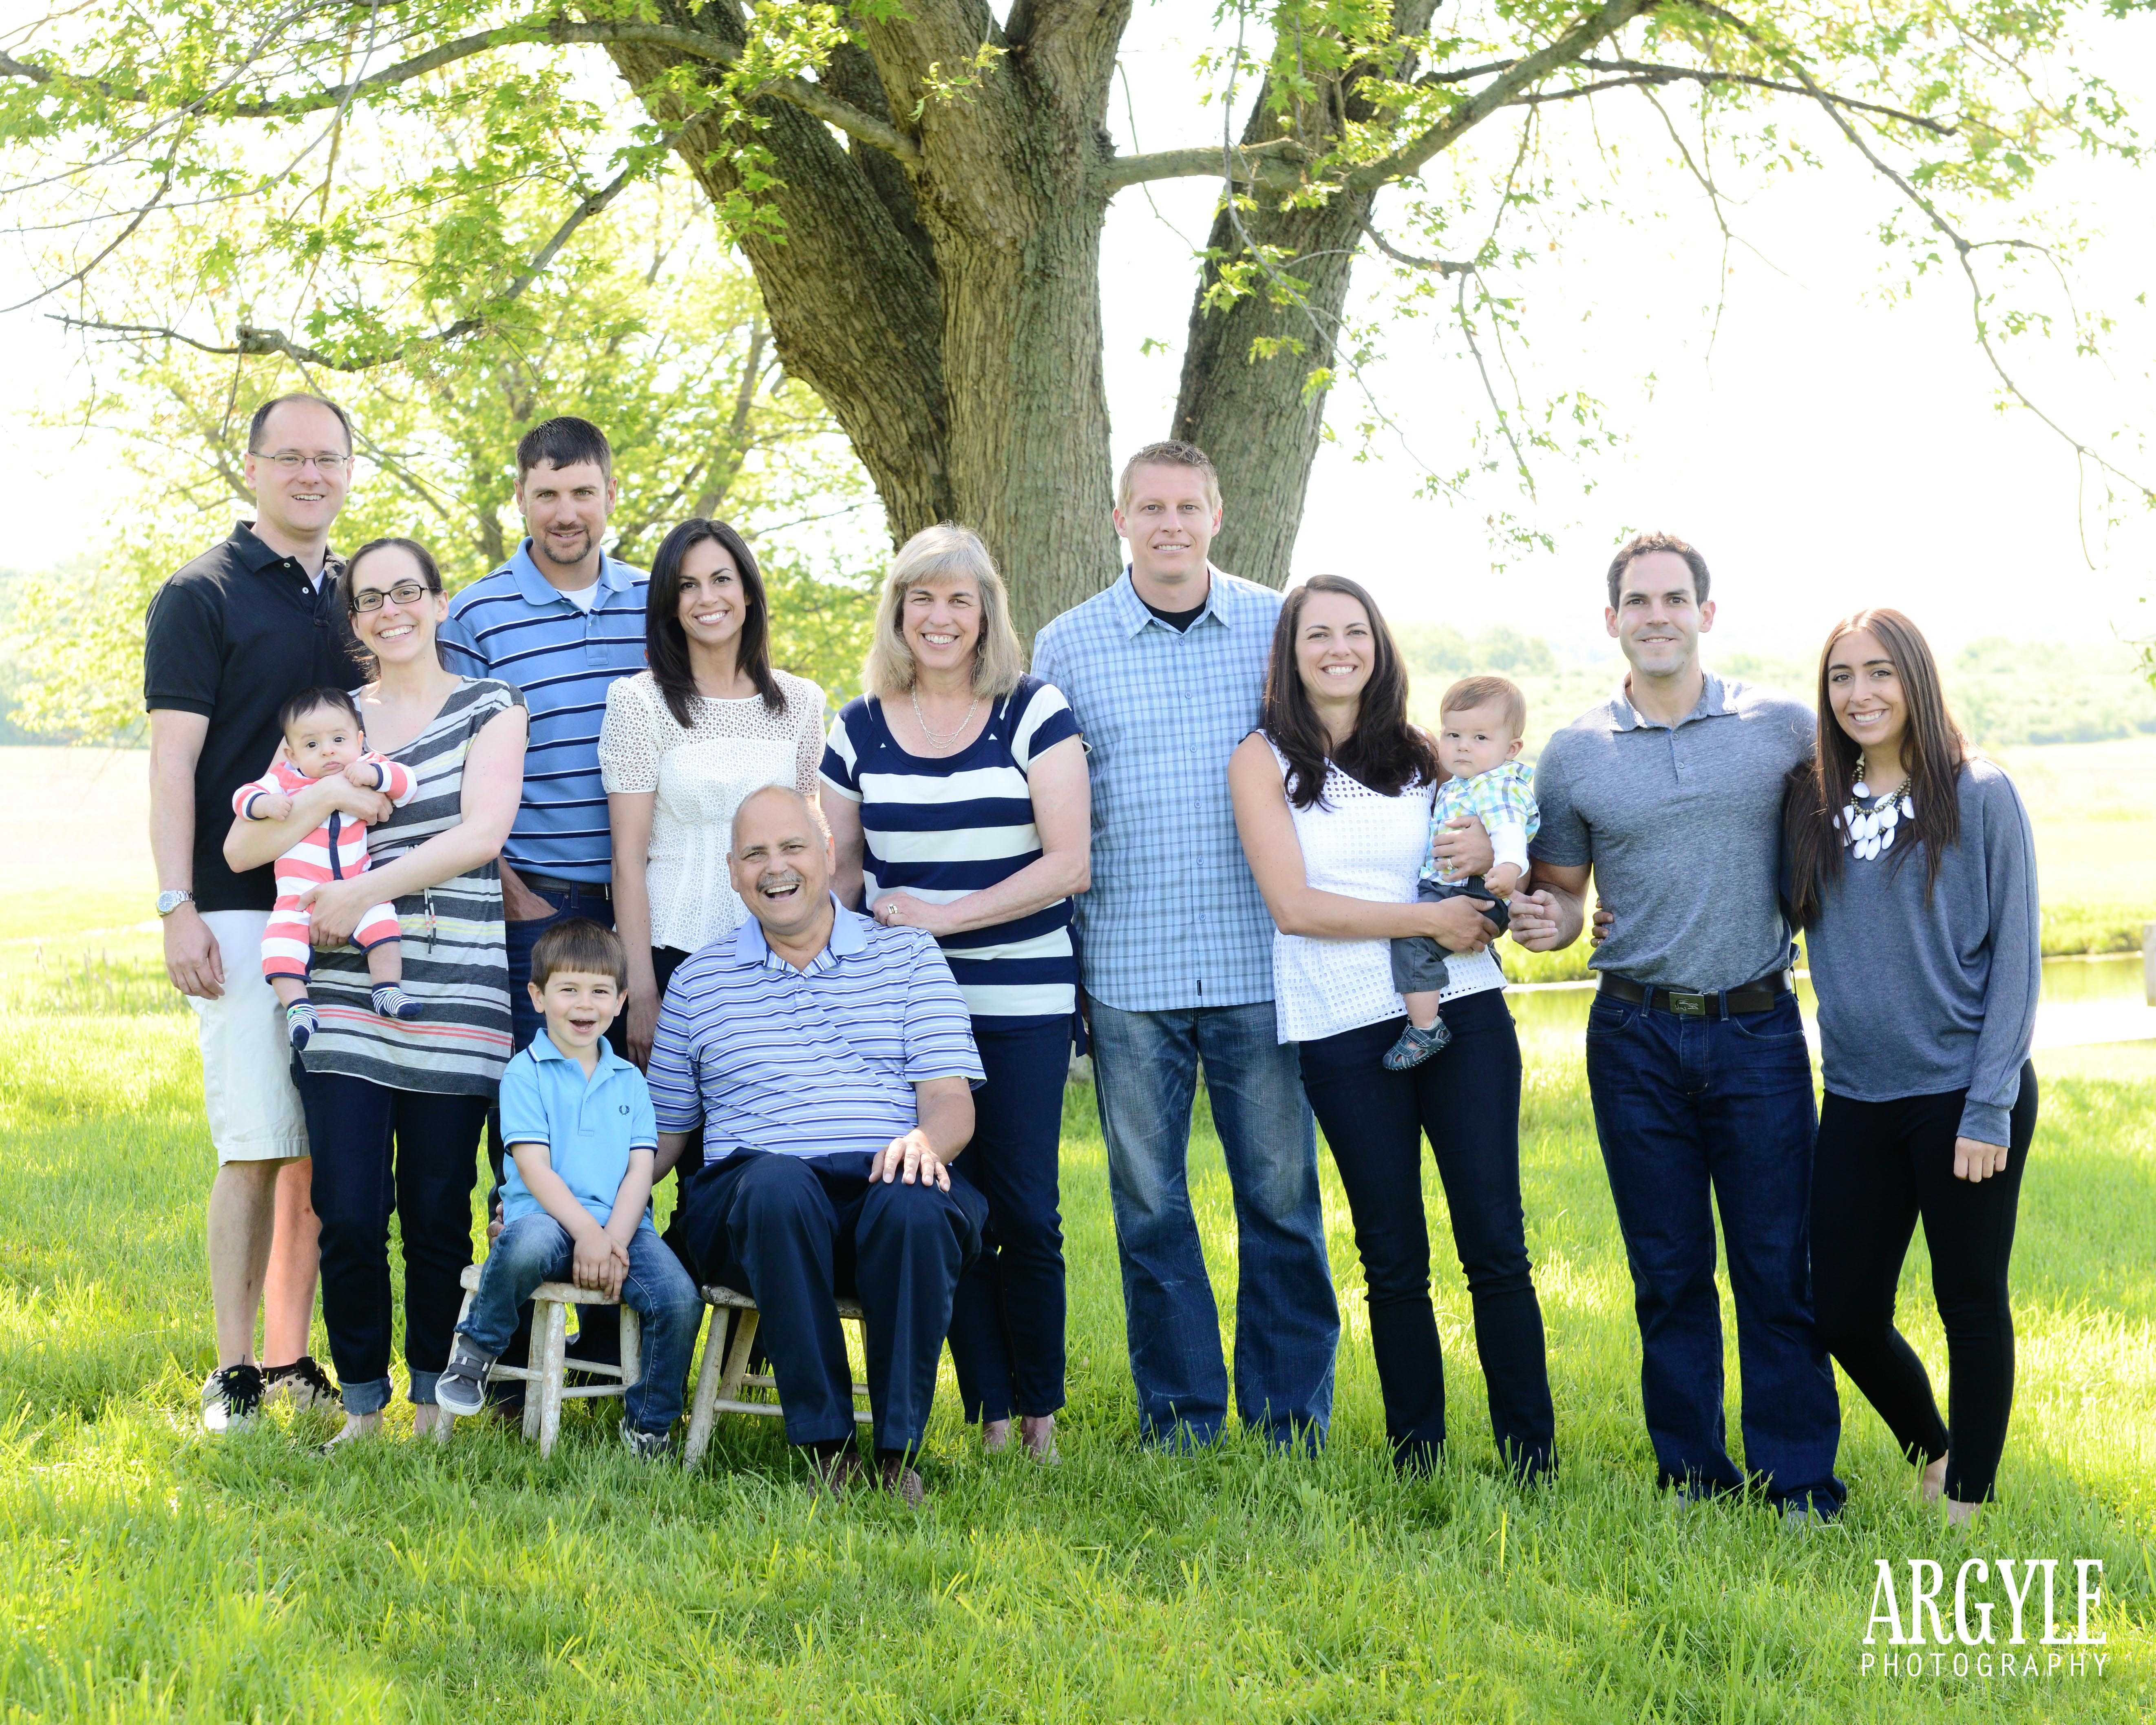 Kozack Family Argyle Photography Heath Ohio 187 Argyle